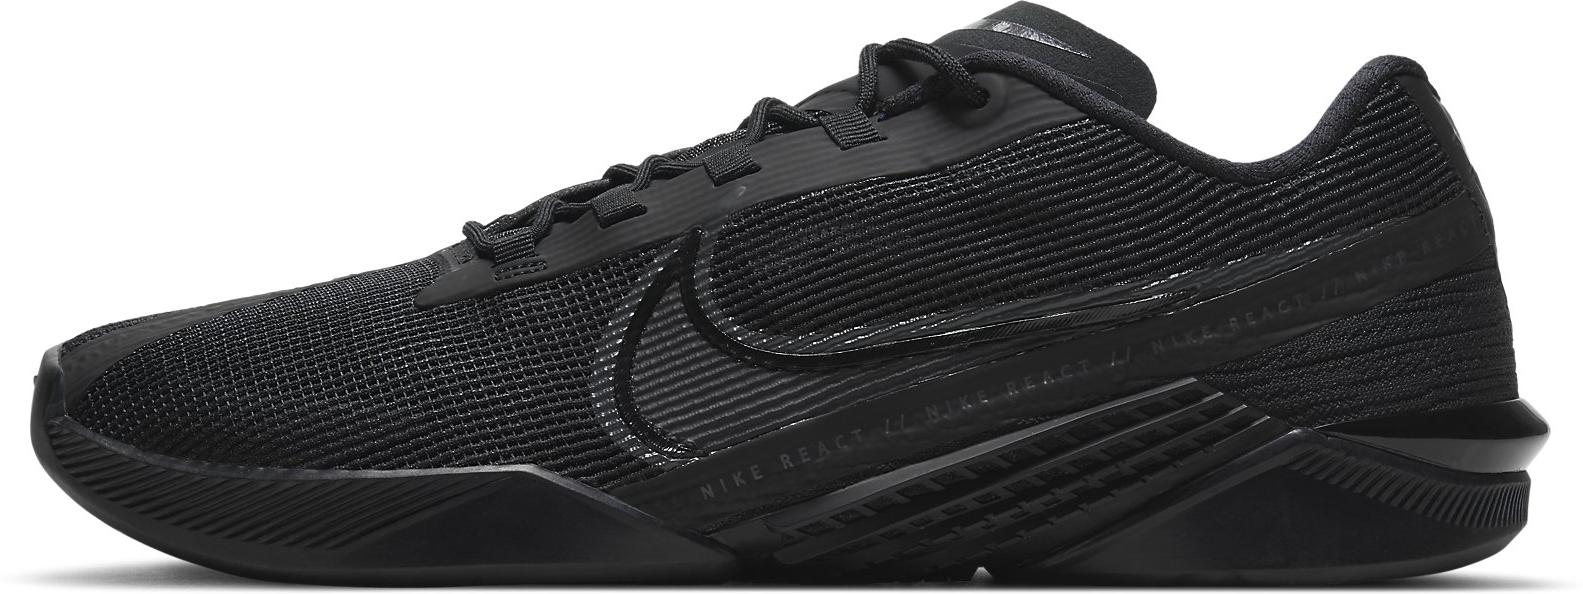 Zapatillas de fitness Nike REACT METCON TURBO